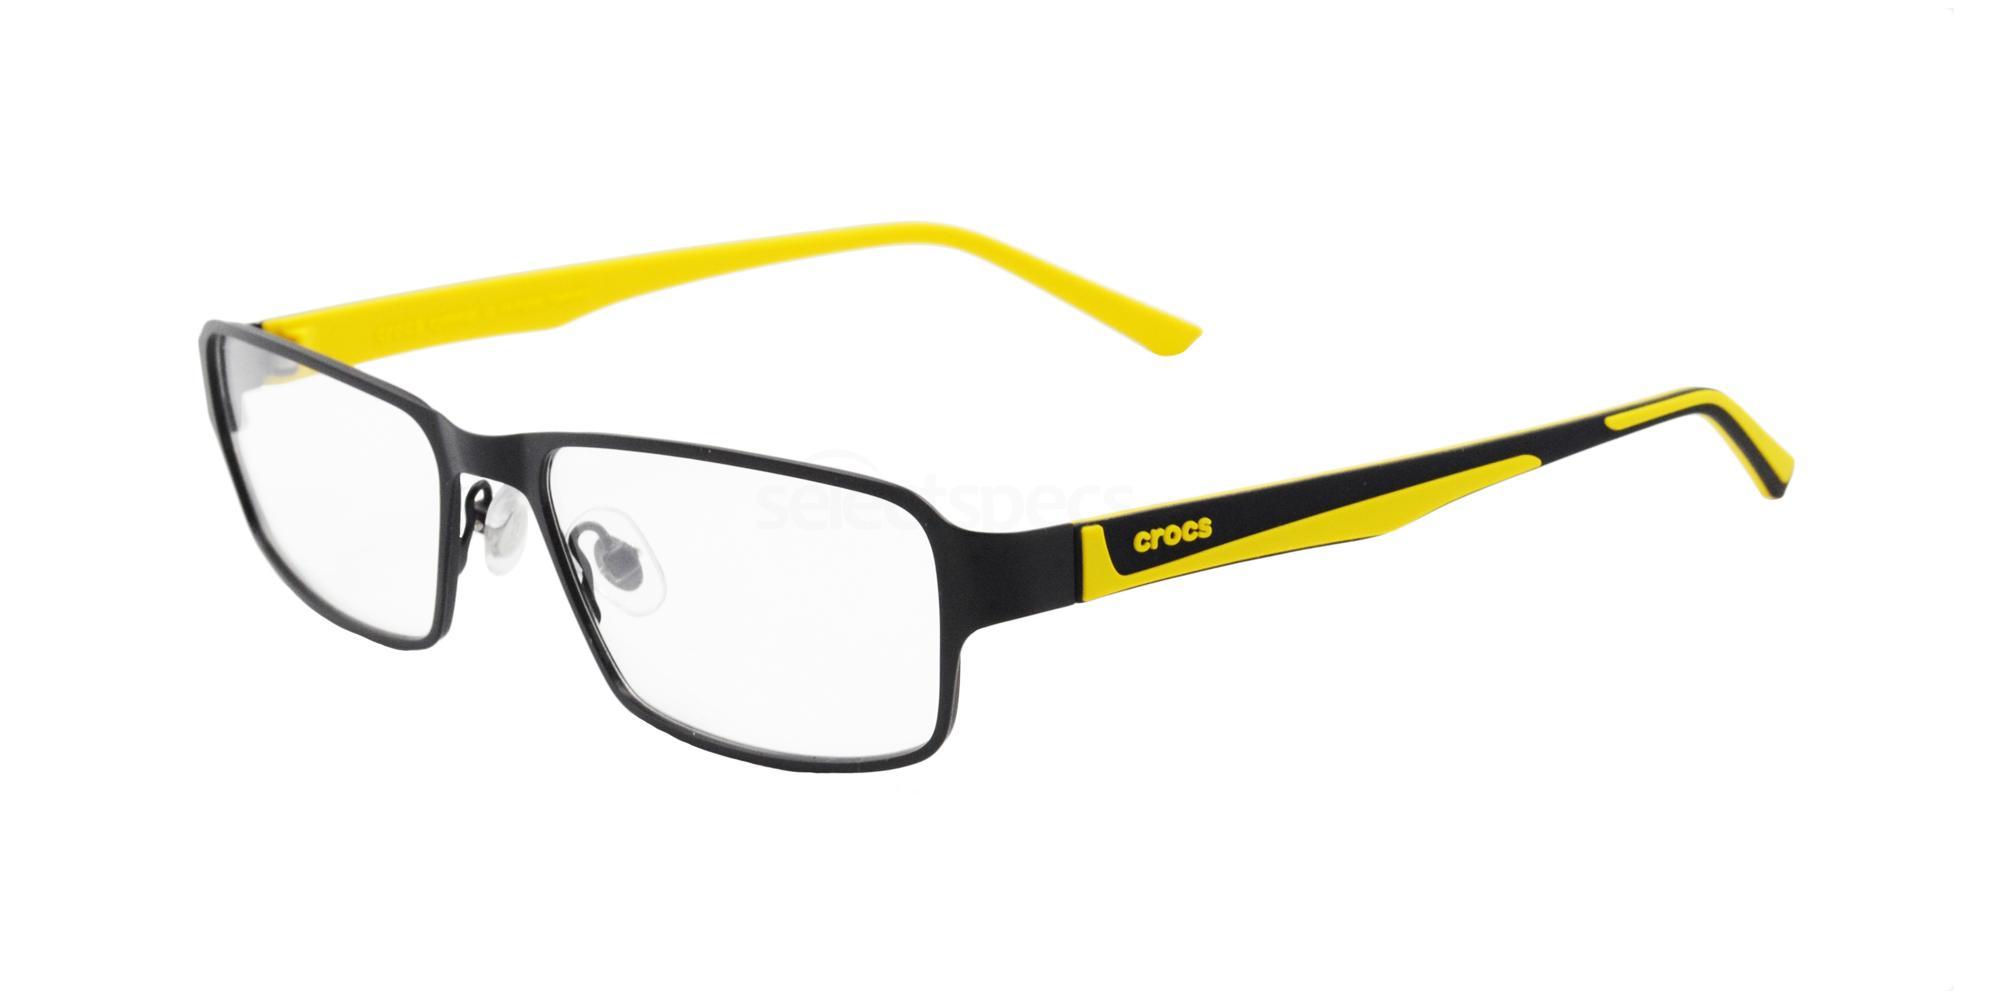 20YW CF3009 Glasses, Crocs Eyewear